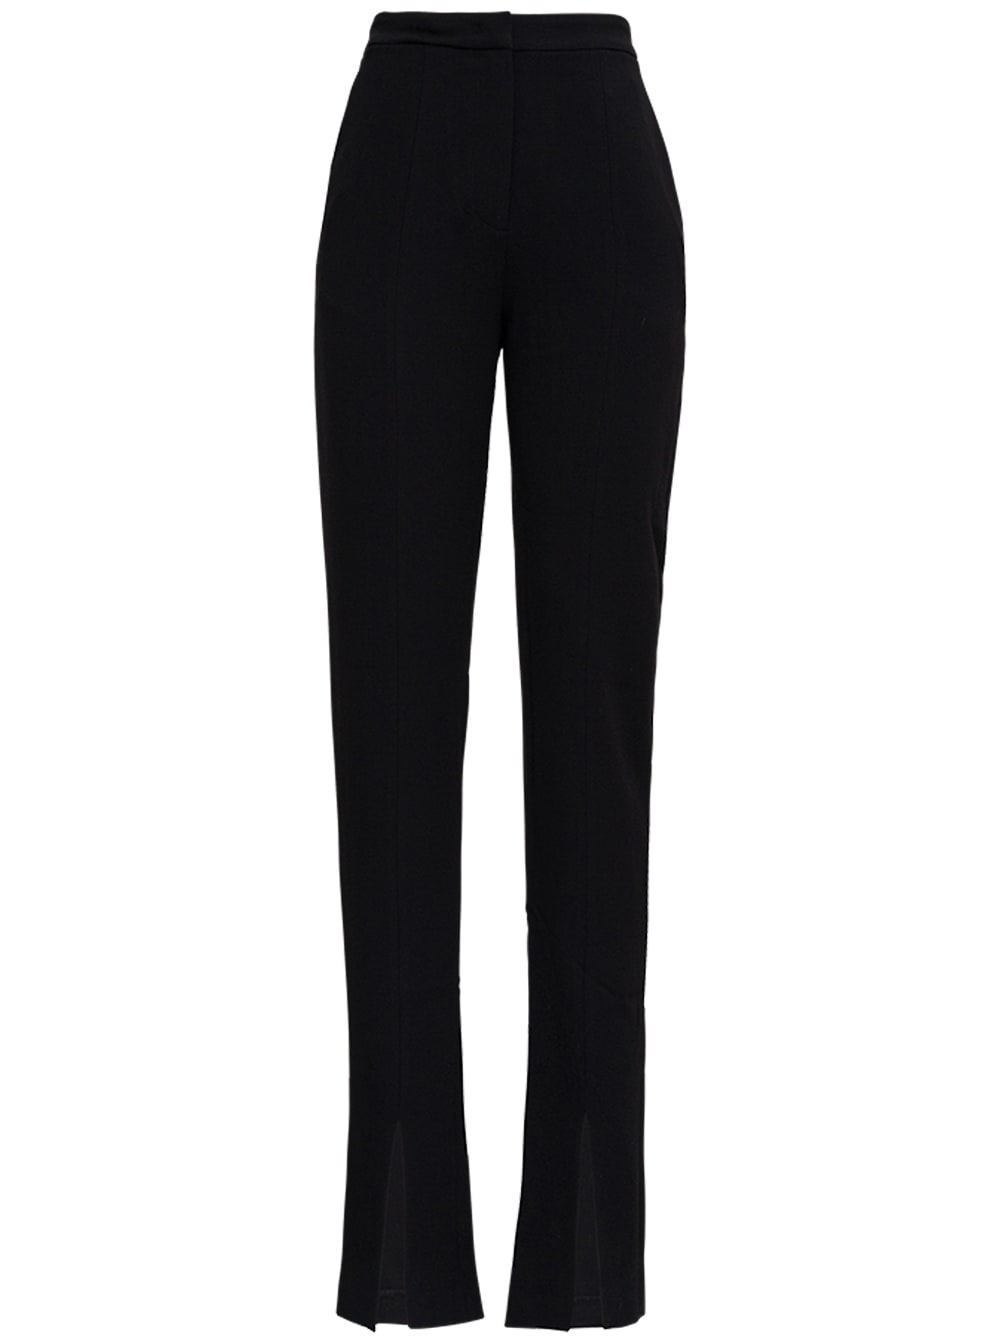 Helena Black Twill Trousers